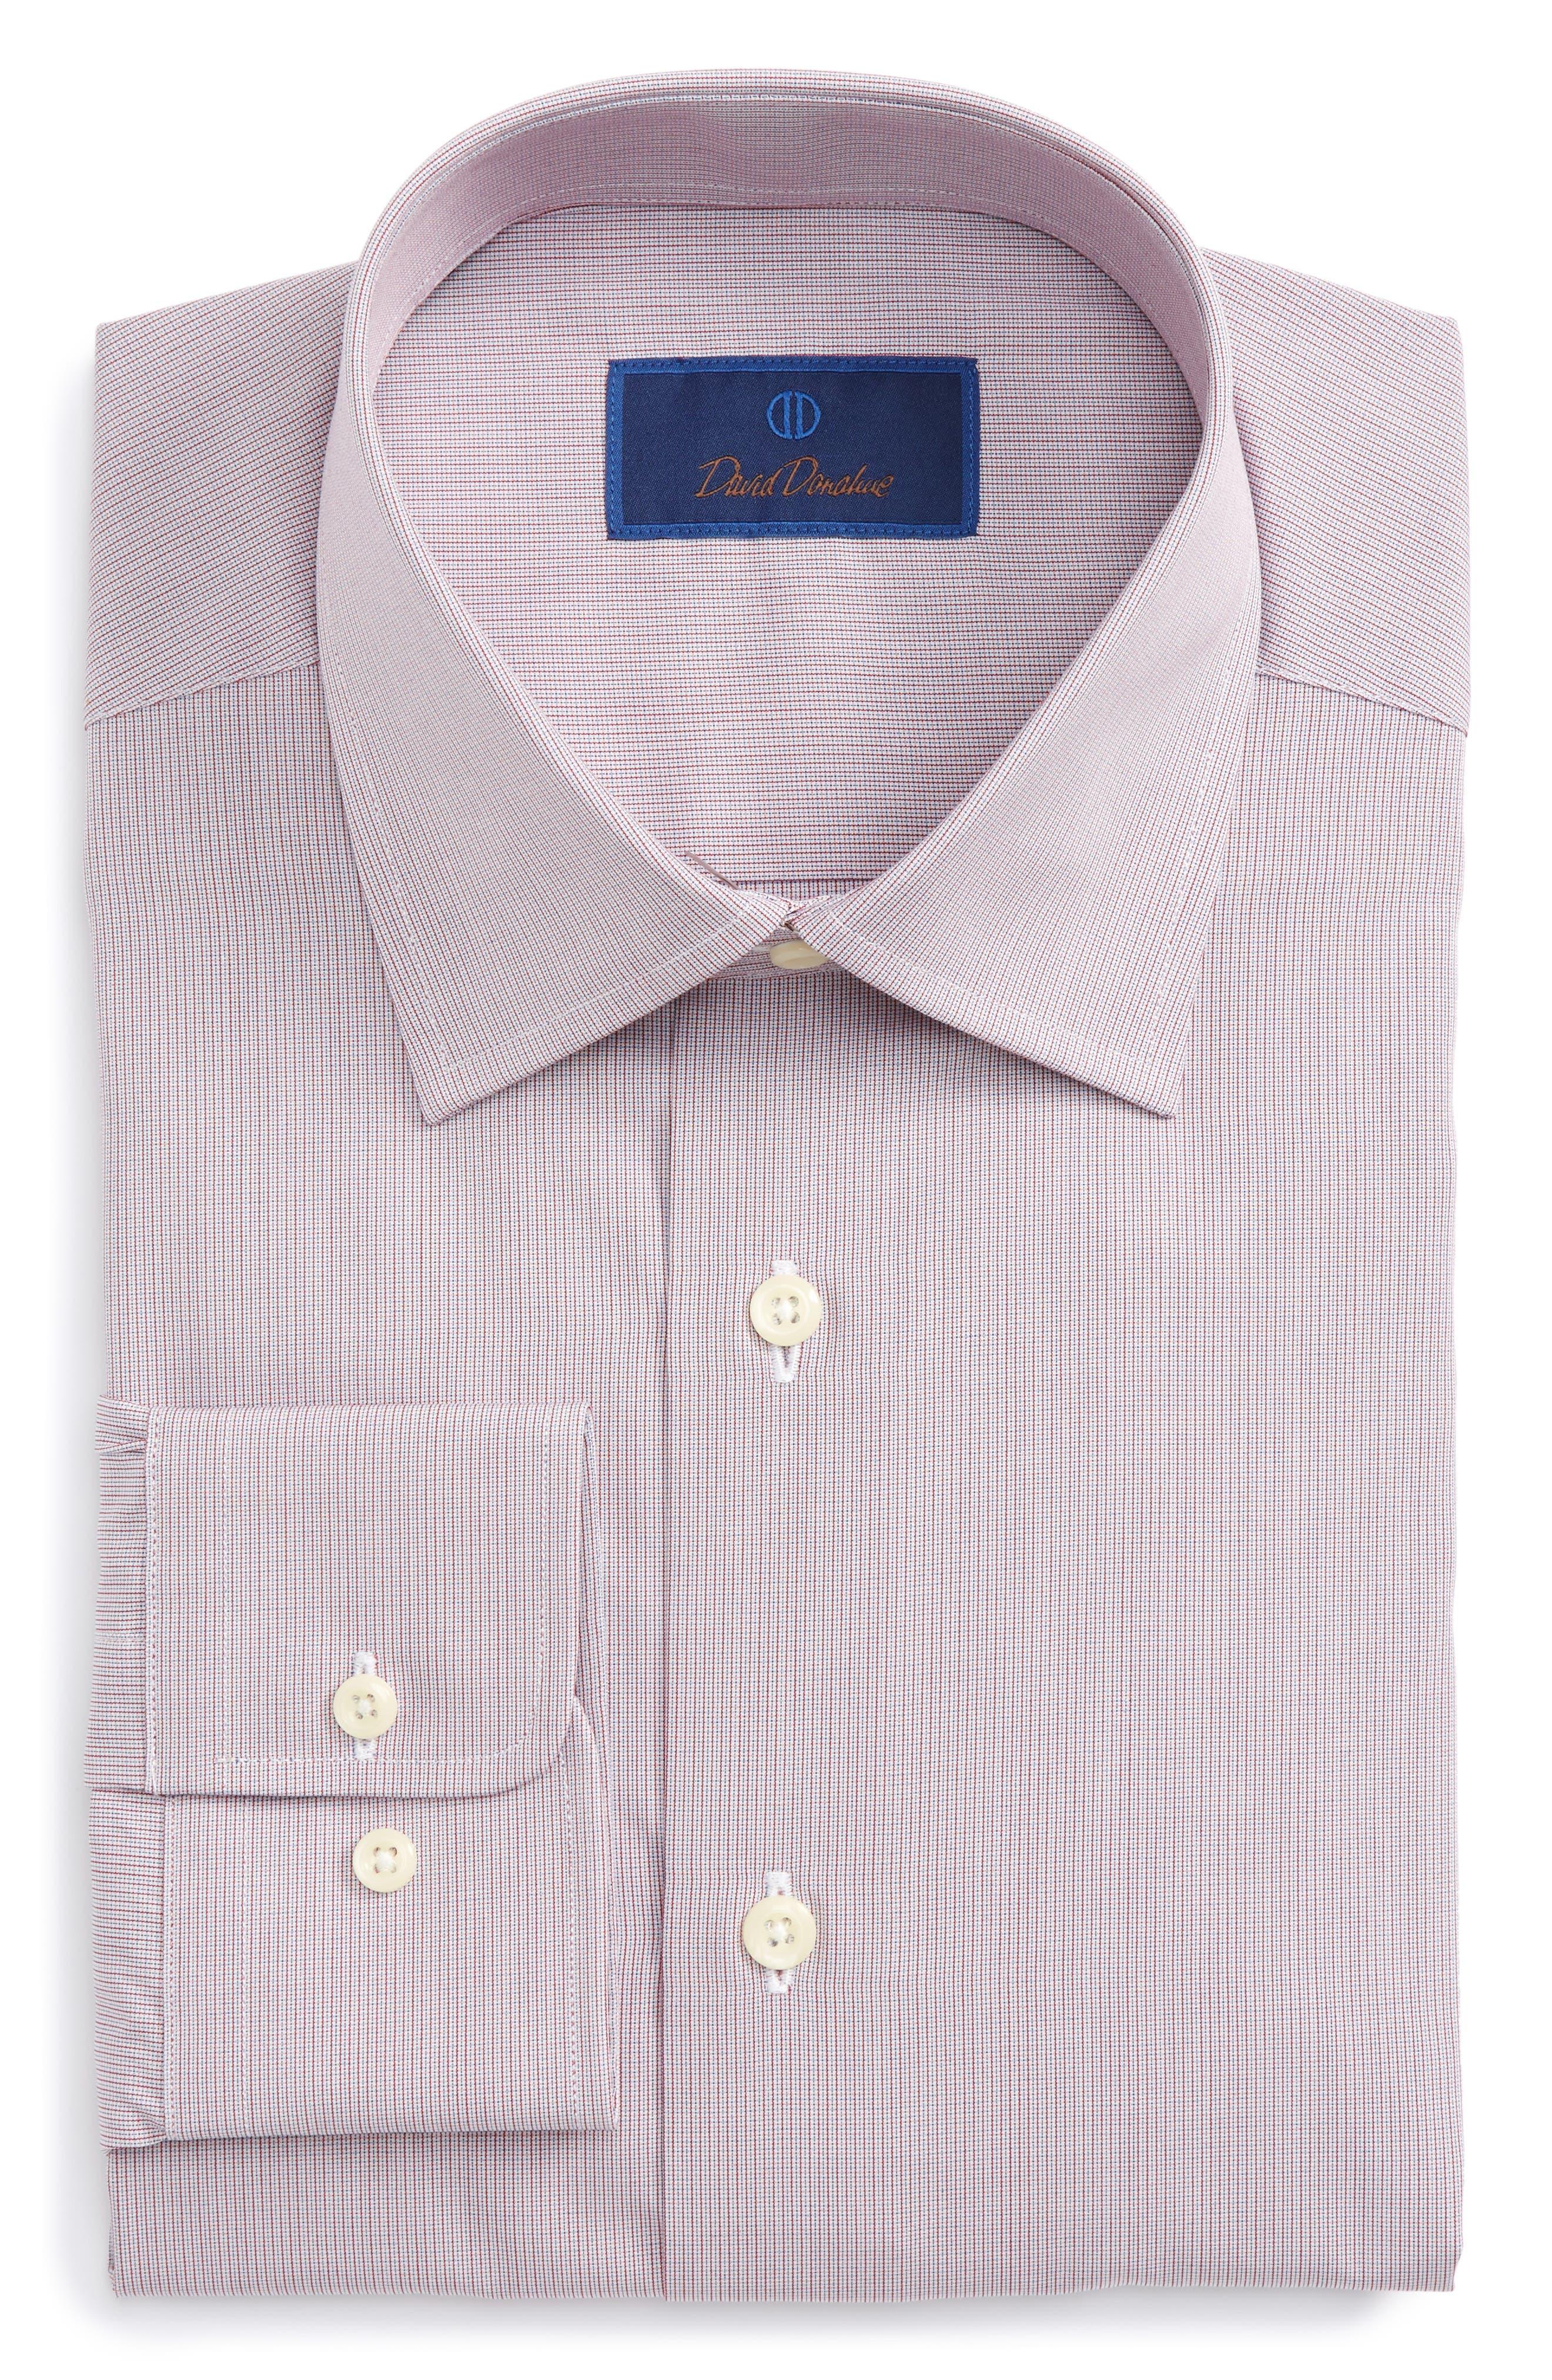 Regular Fit Check Dress Shirt,                         Main,                         color, Merlot